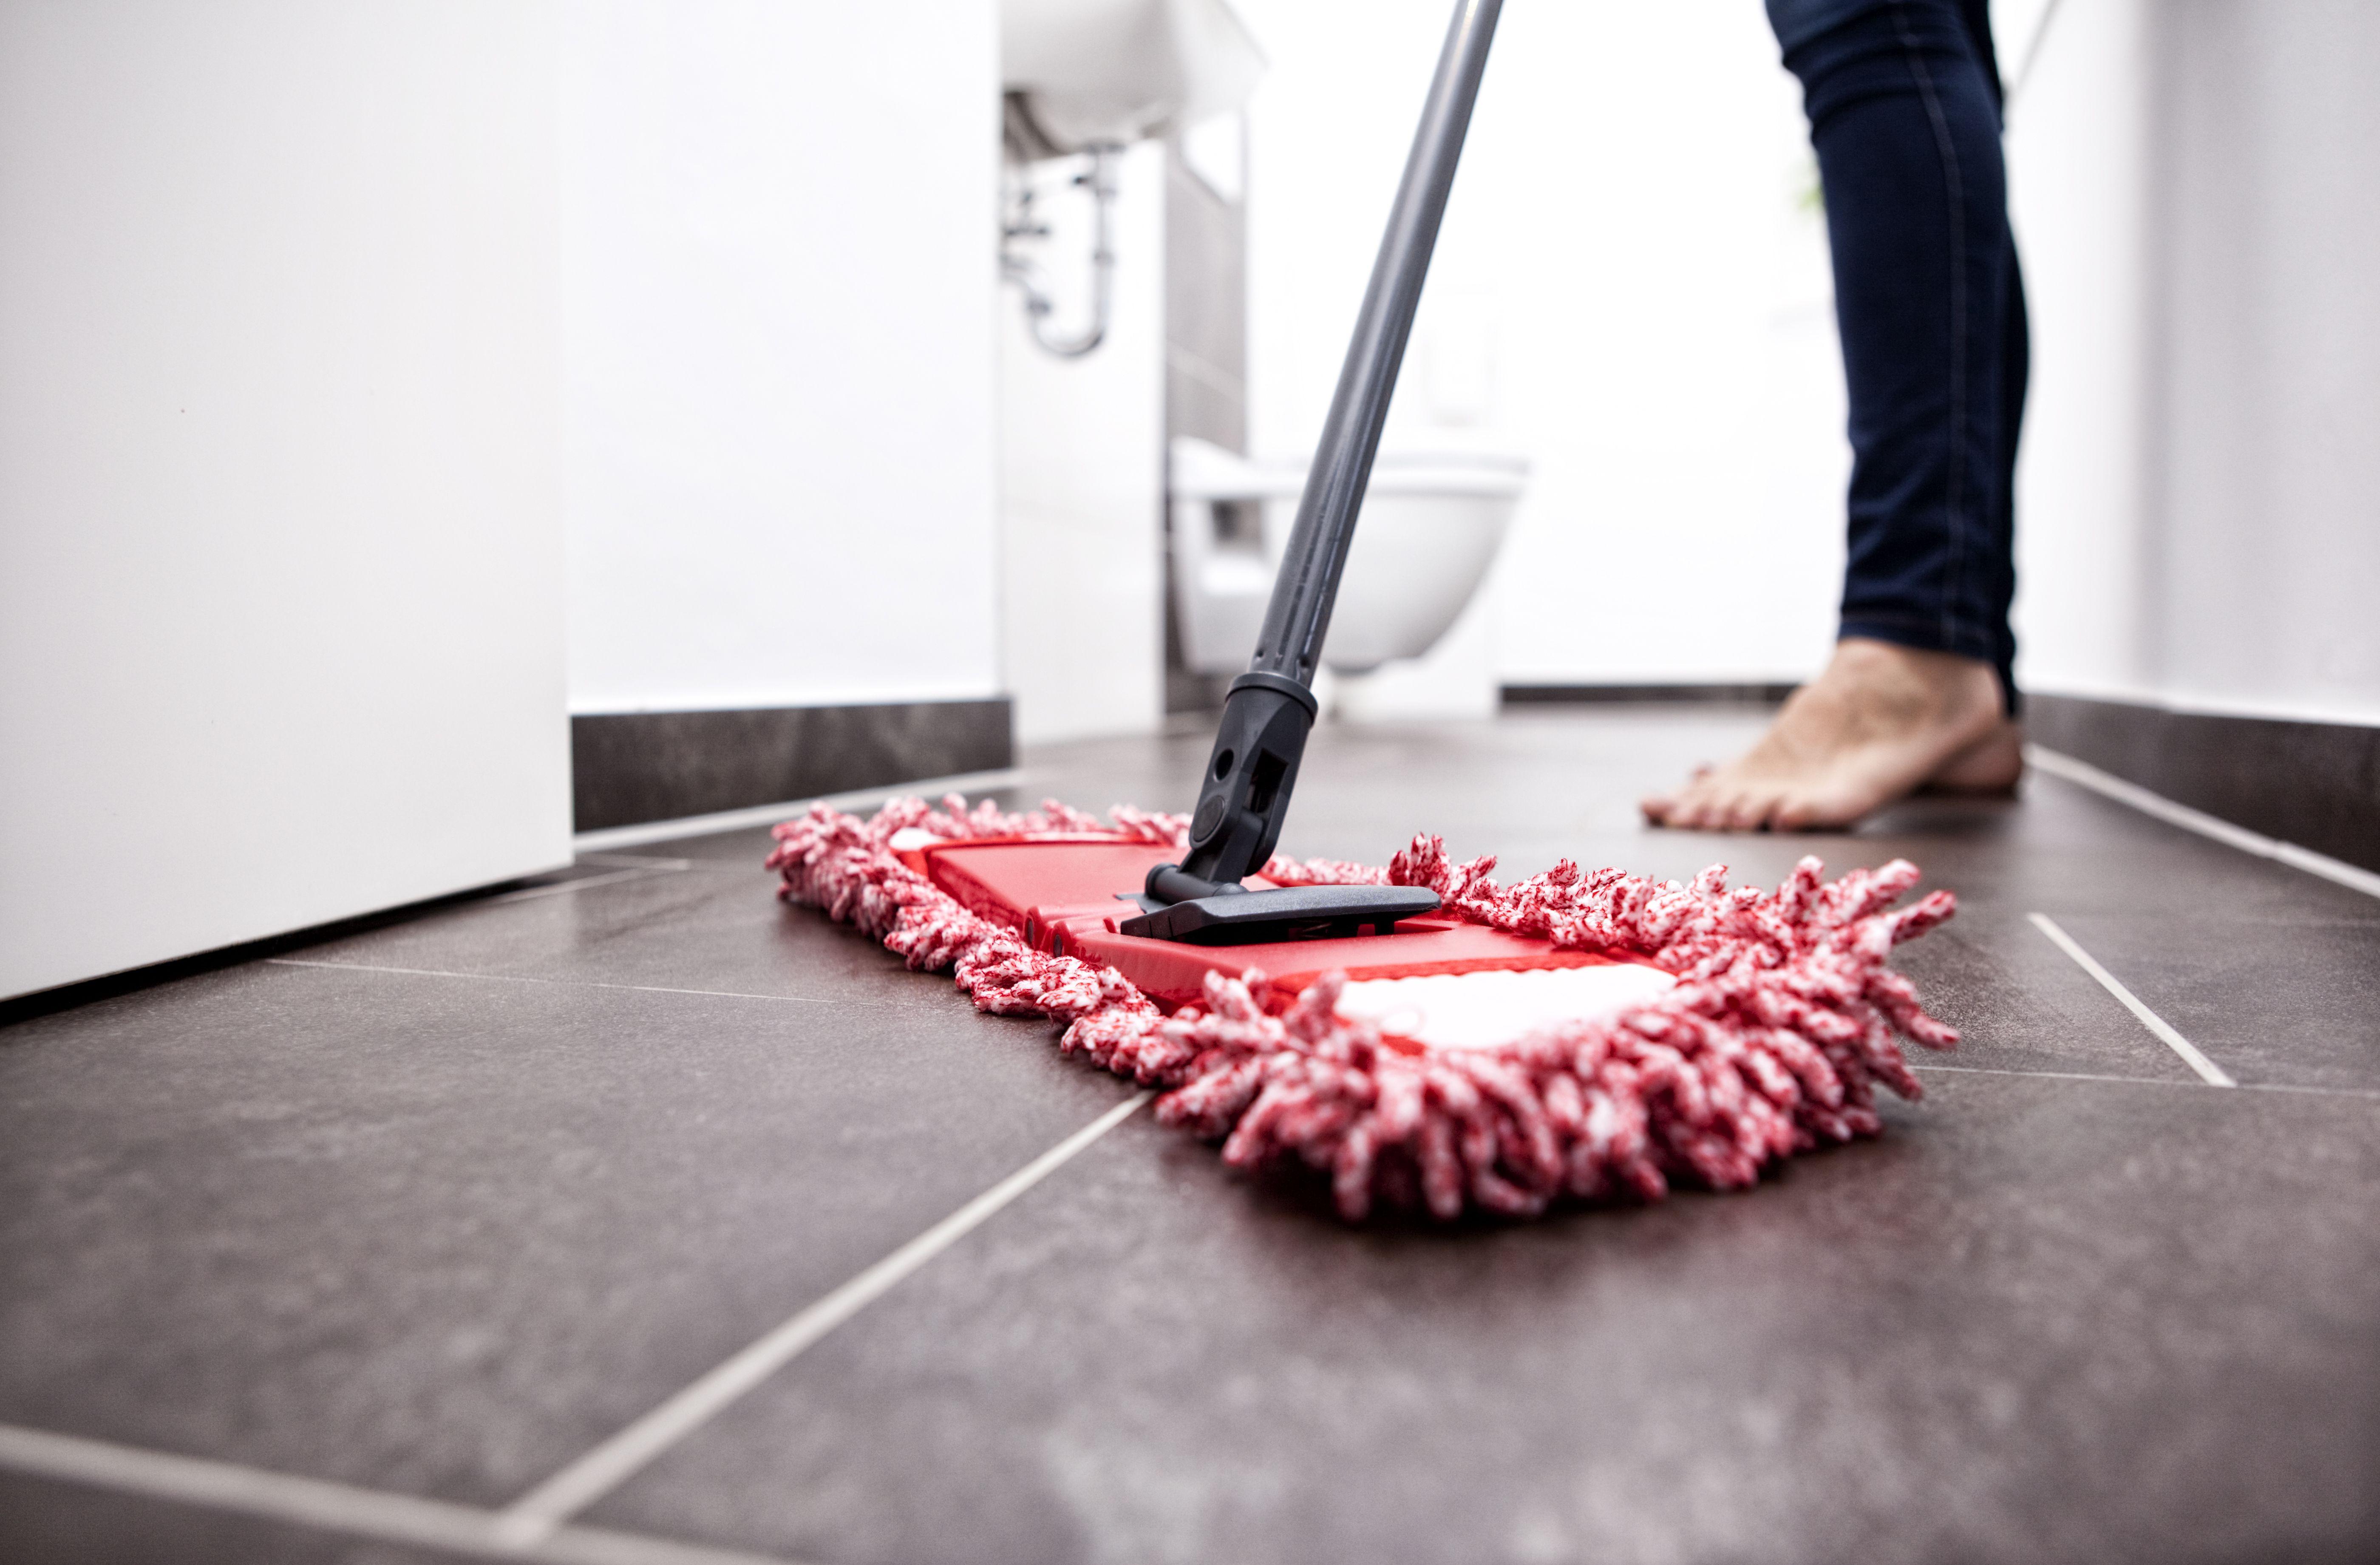 5 best bedroom flooring materials cleaning self adhesive floor tiles vinyl cork linoleum and rubber dailygadgetfo Images